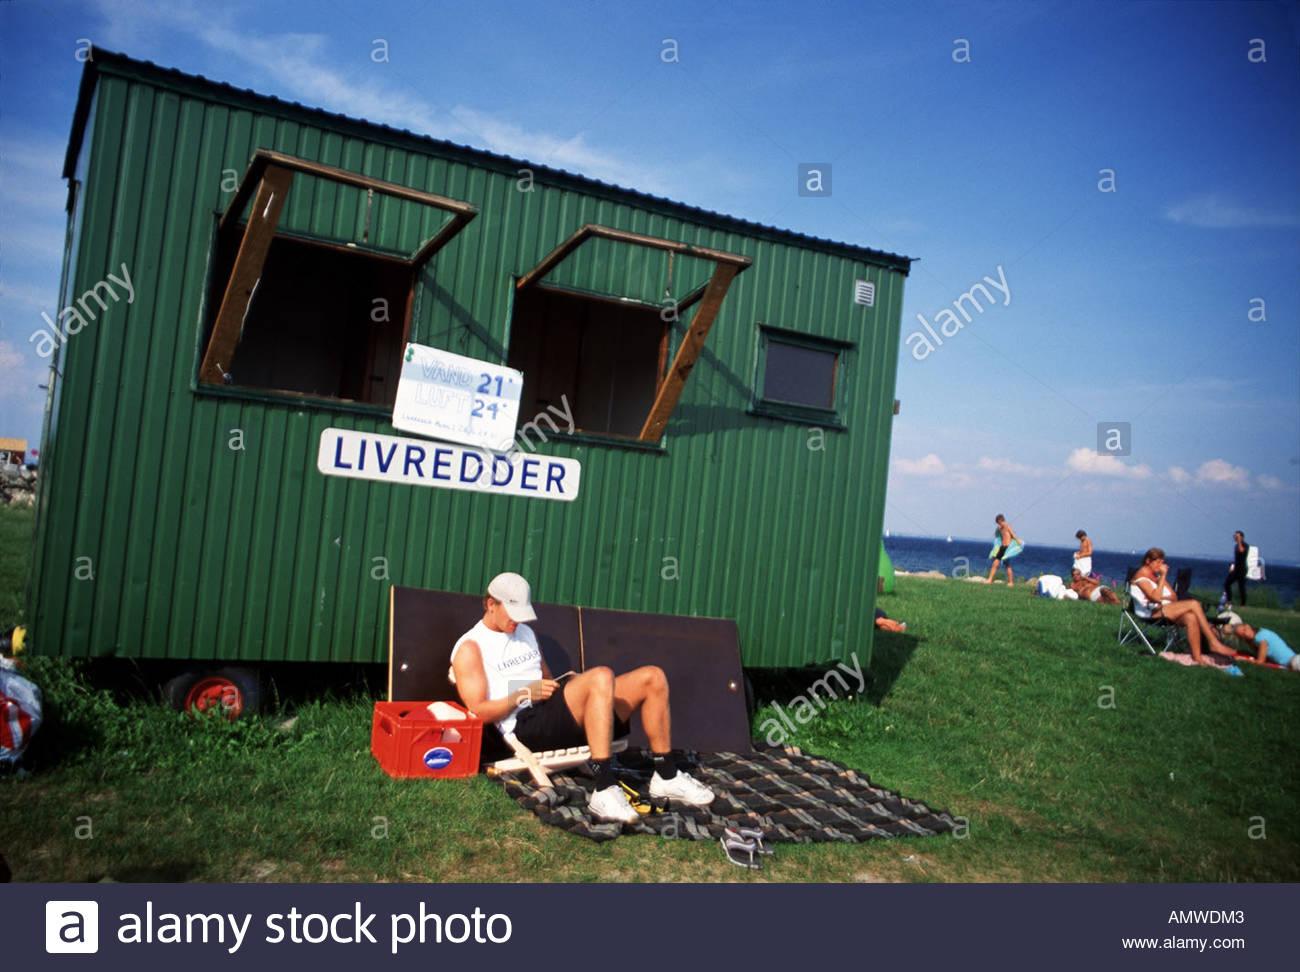 Niva Beach lifeguard, North Zealand, Denmark - Stock Image